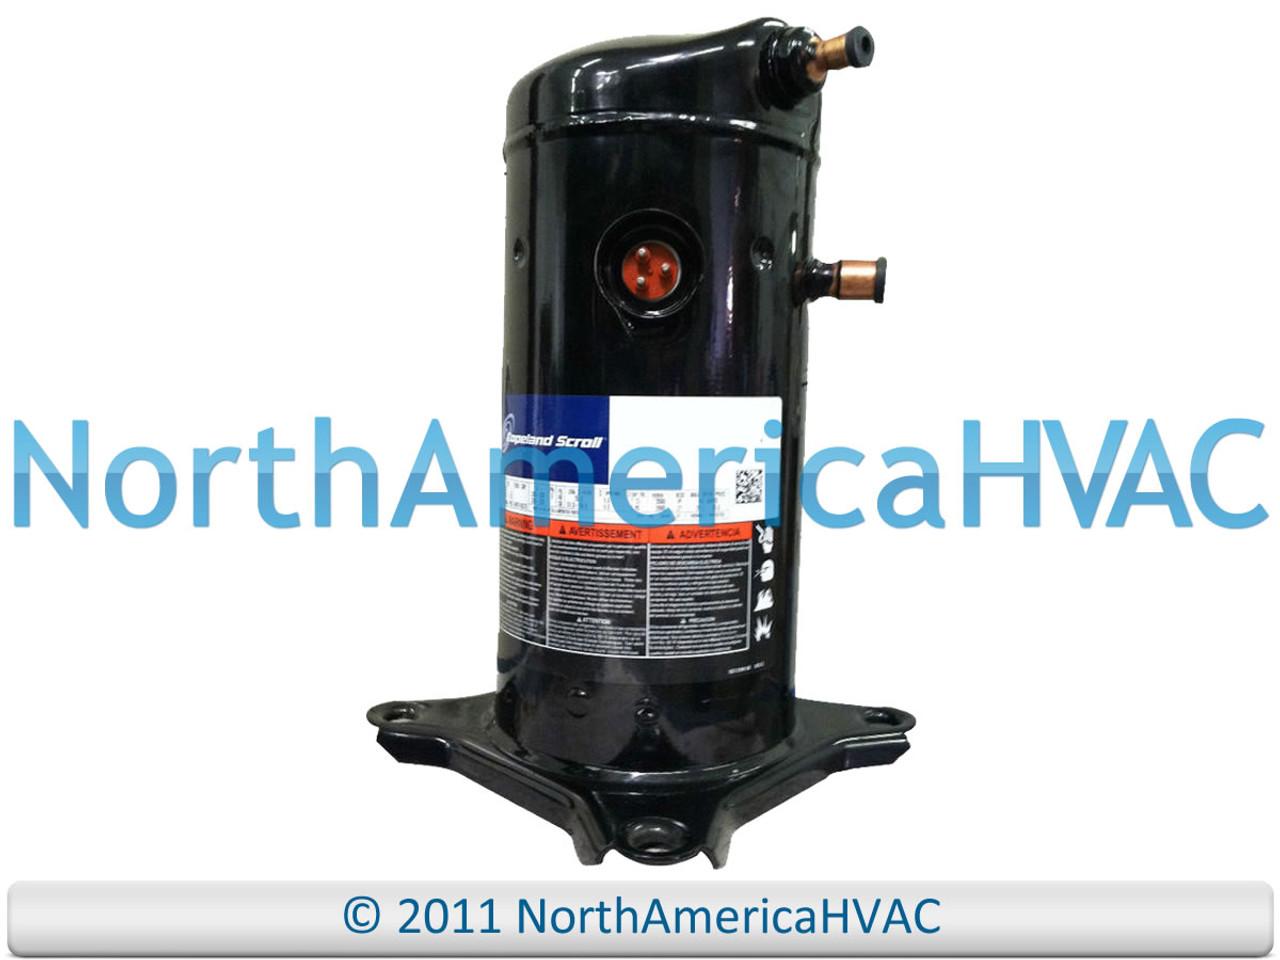 Copeland 5 Ton Scroll Compressor ZR57K3-PFV-260 ZR57K3-PFV-260  ZR57K3-PFV-130 - North America HVACNorth America HVAC